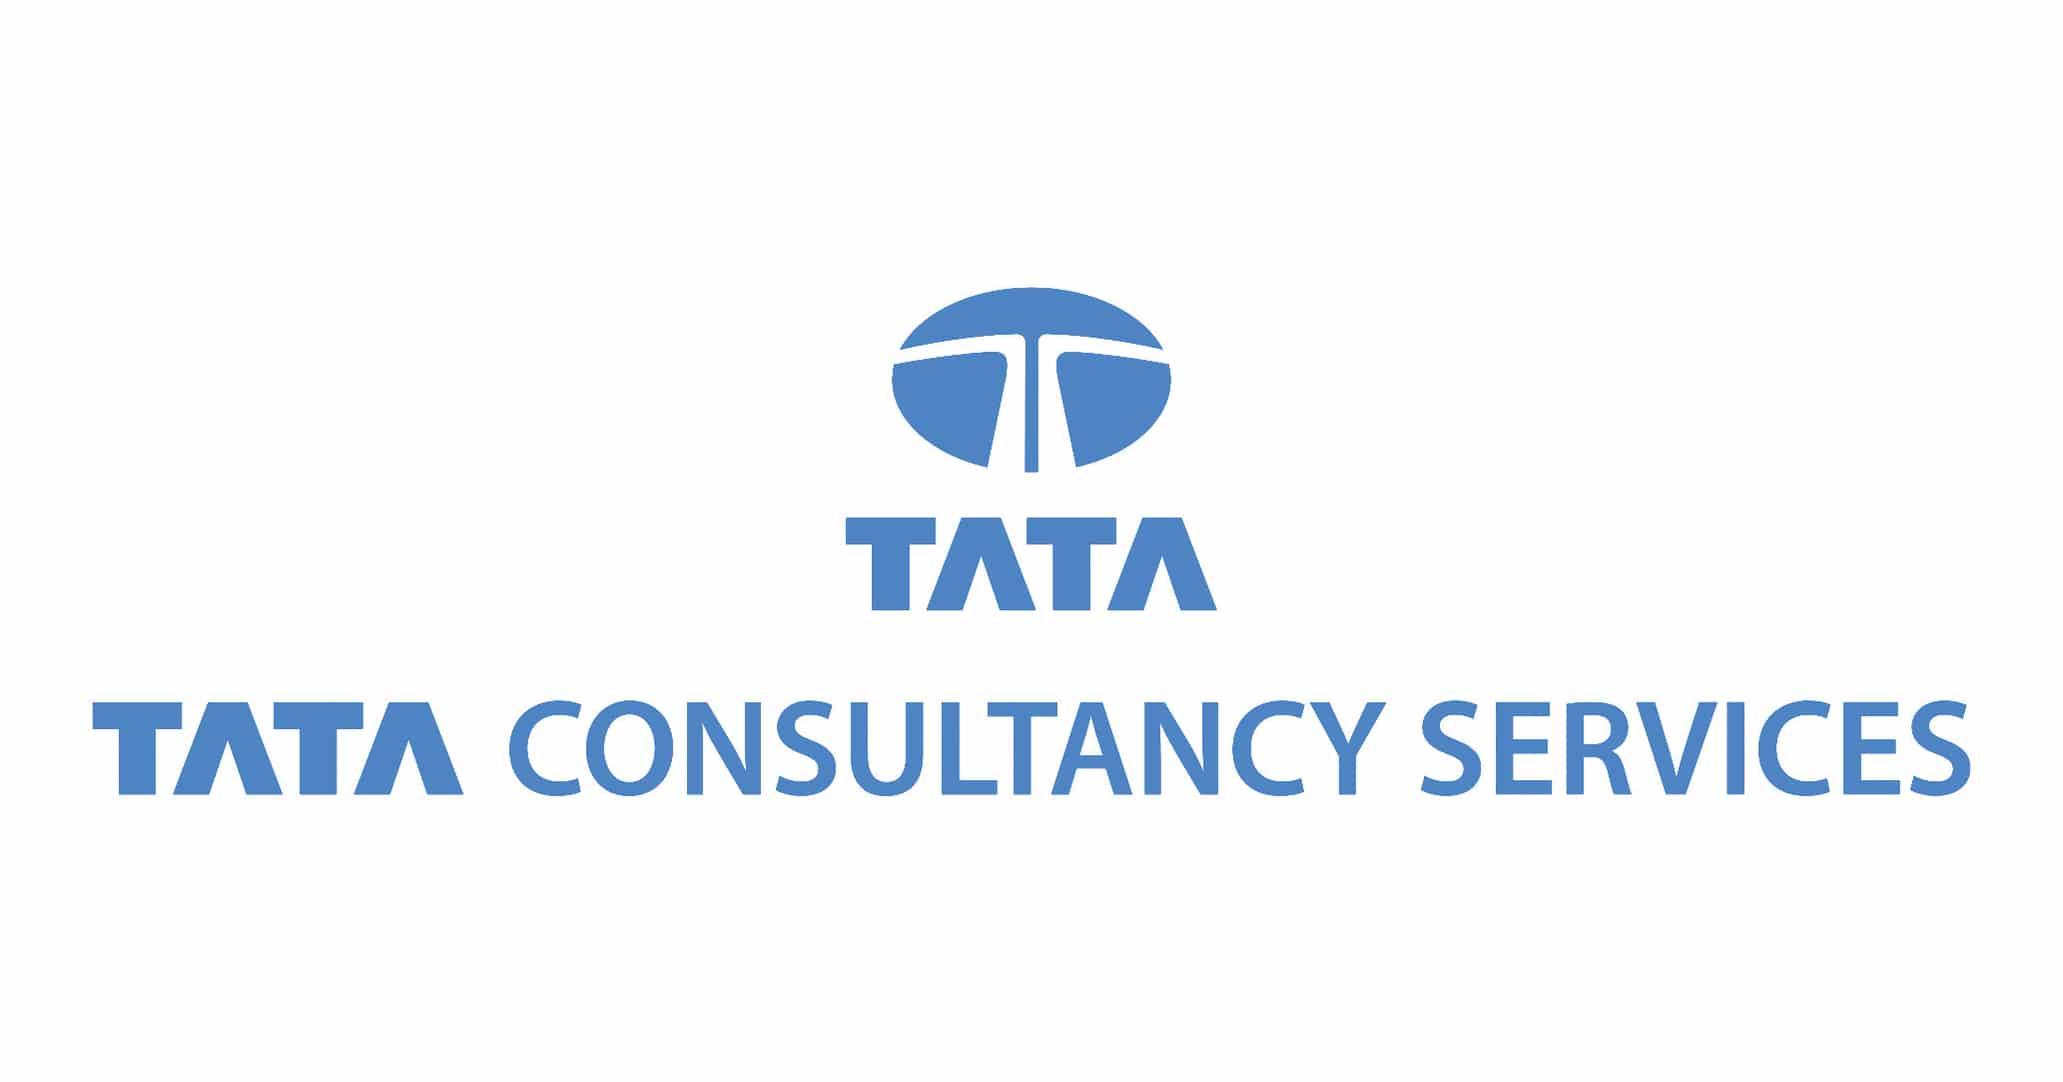 TATA CONSULTANCY SERVICES | TATA AMERICA INTERNATIONAL